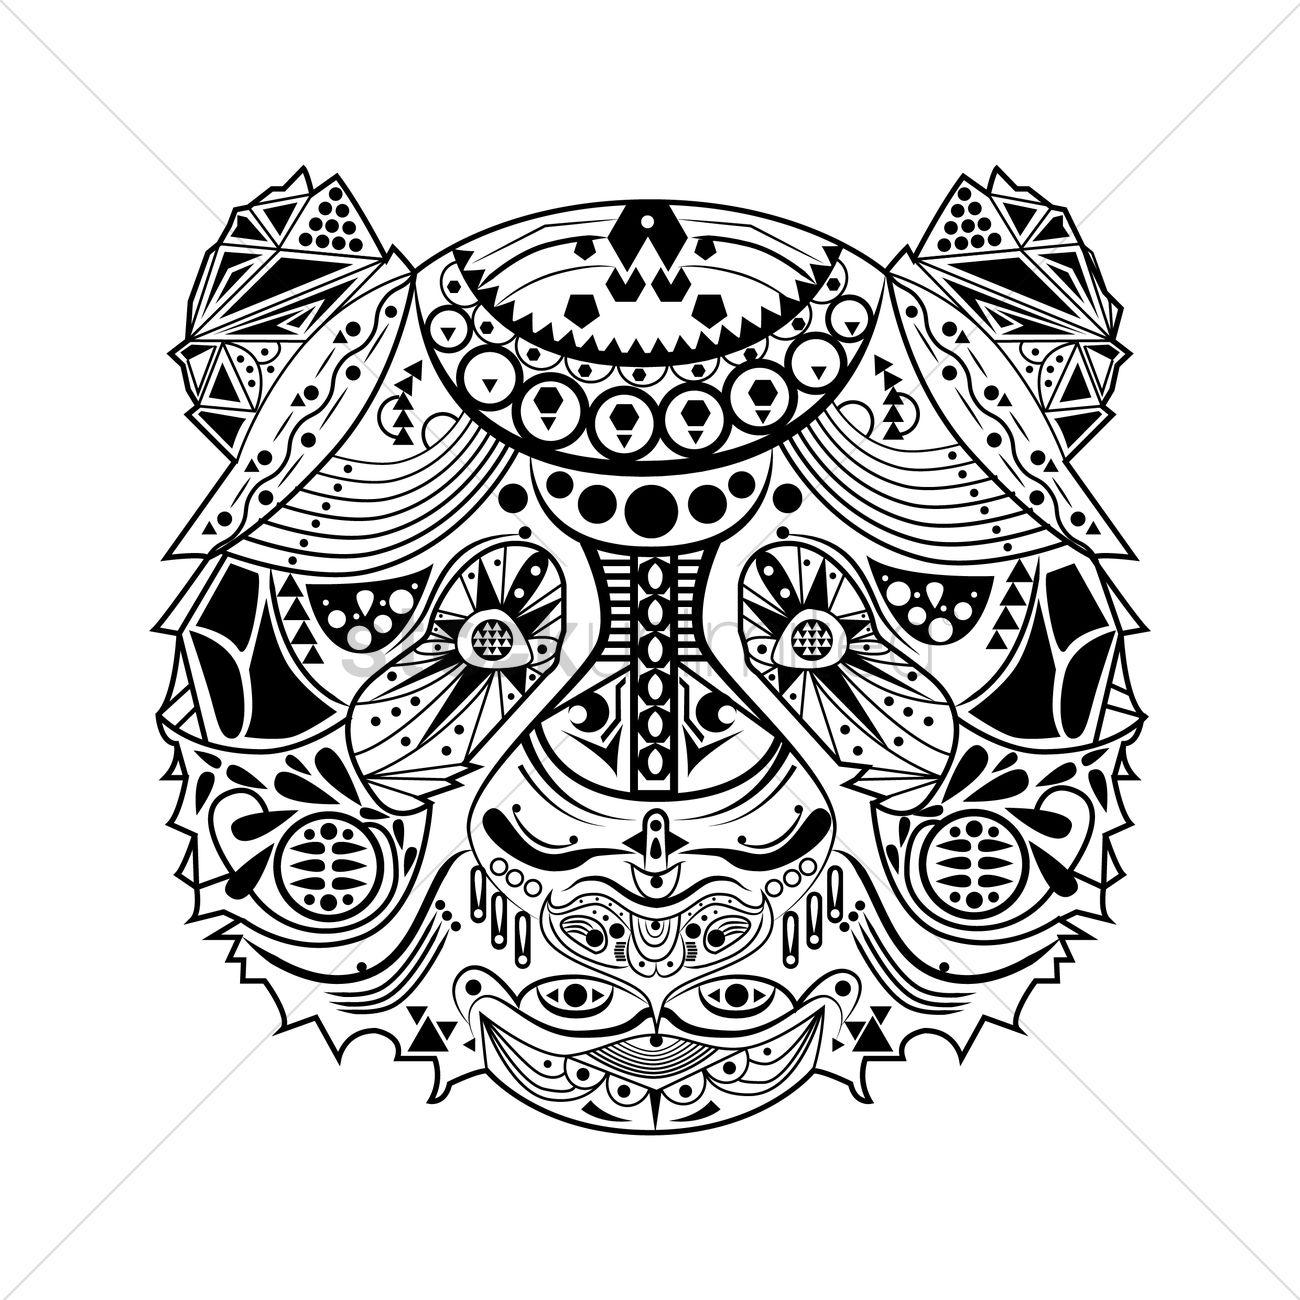 Intricate bear design Vector Image - 1556620 | StockUnlimited Bear Design